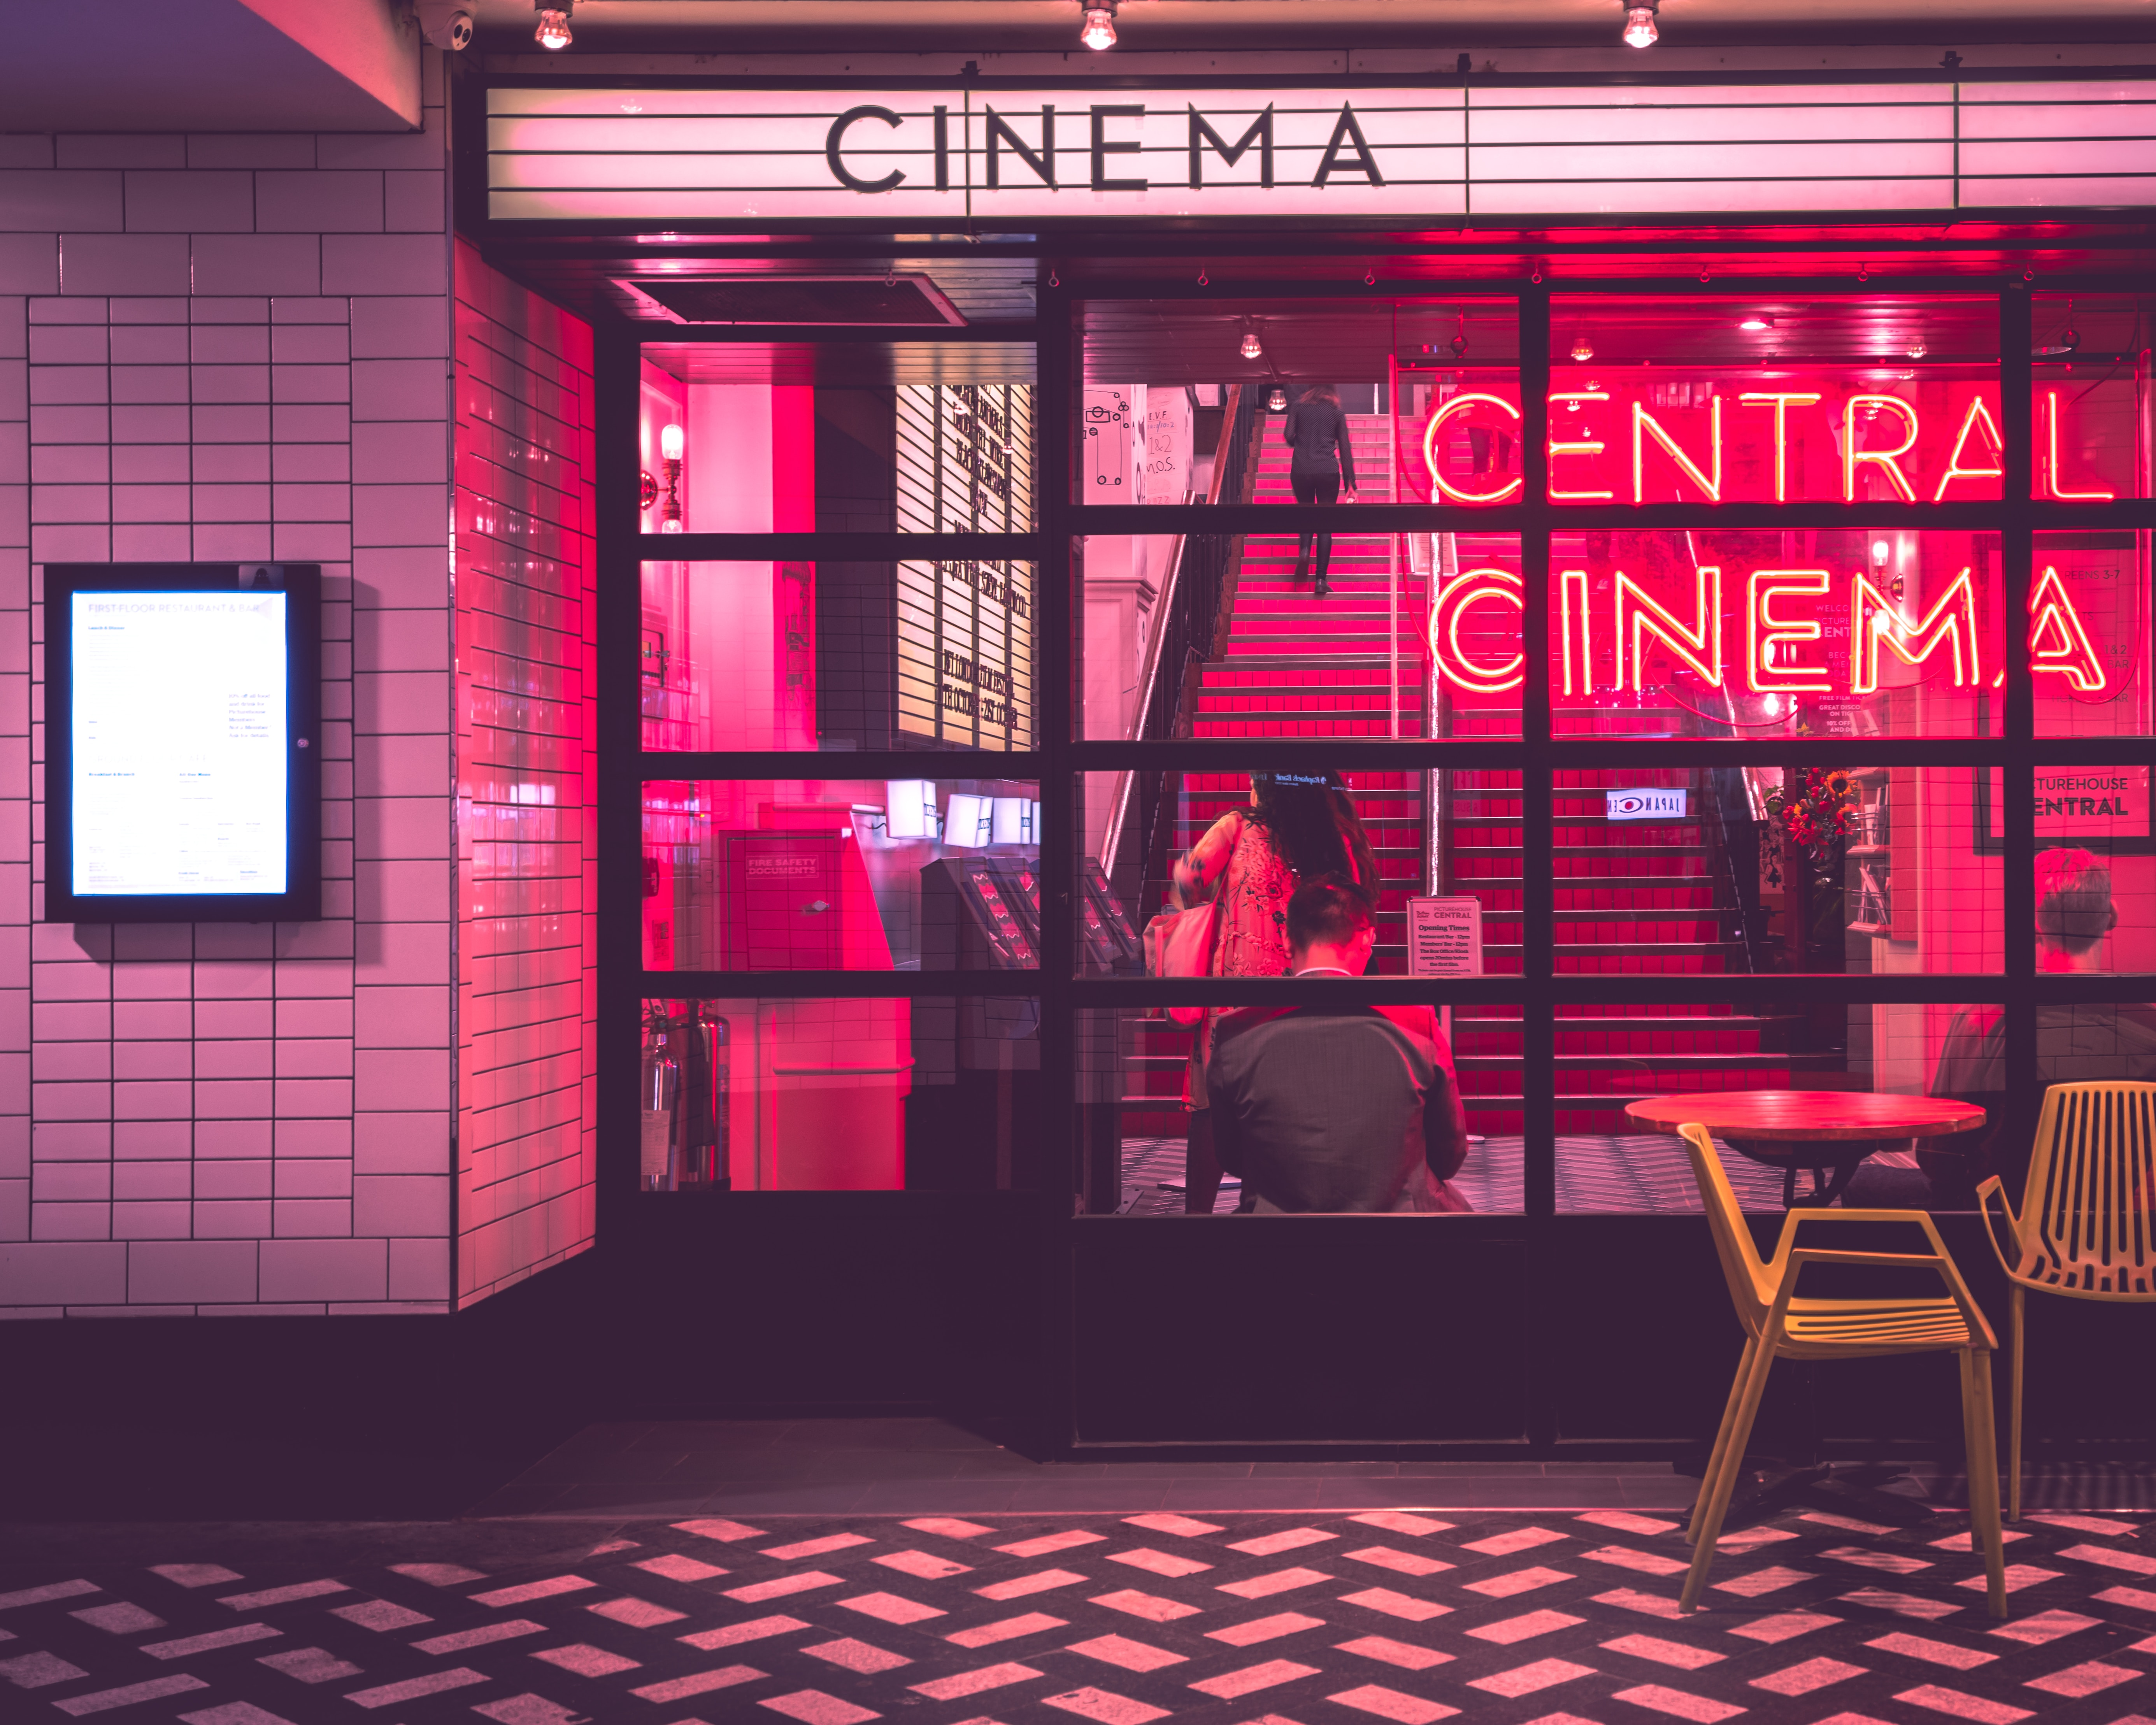 Nebenjob im Kino bei CinemaxX AG   NebenJob DE